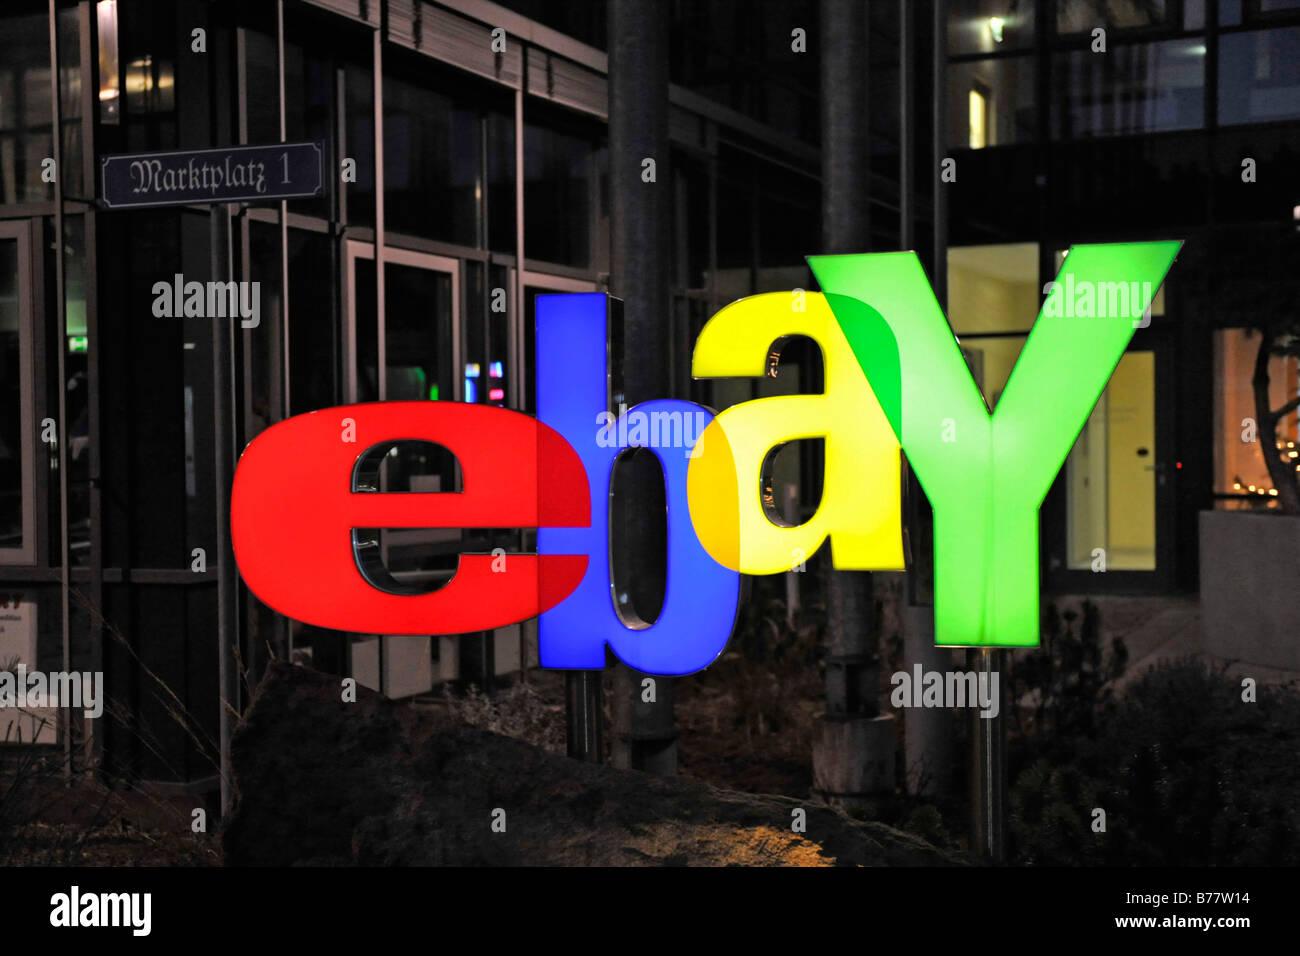 Illuminated ebay logo at night, at the main entrance of the German headquarters in Kleinmachnow near Berlin, Germany, - Stock Image